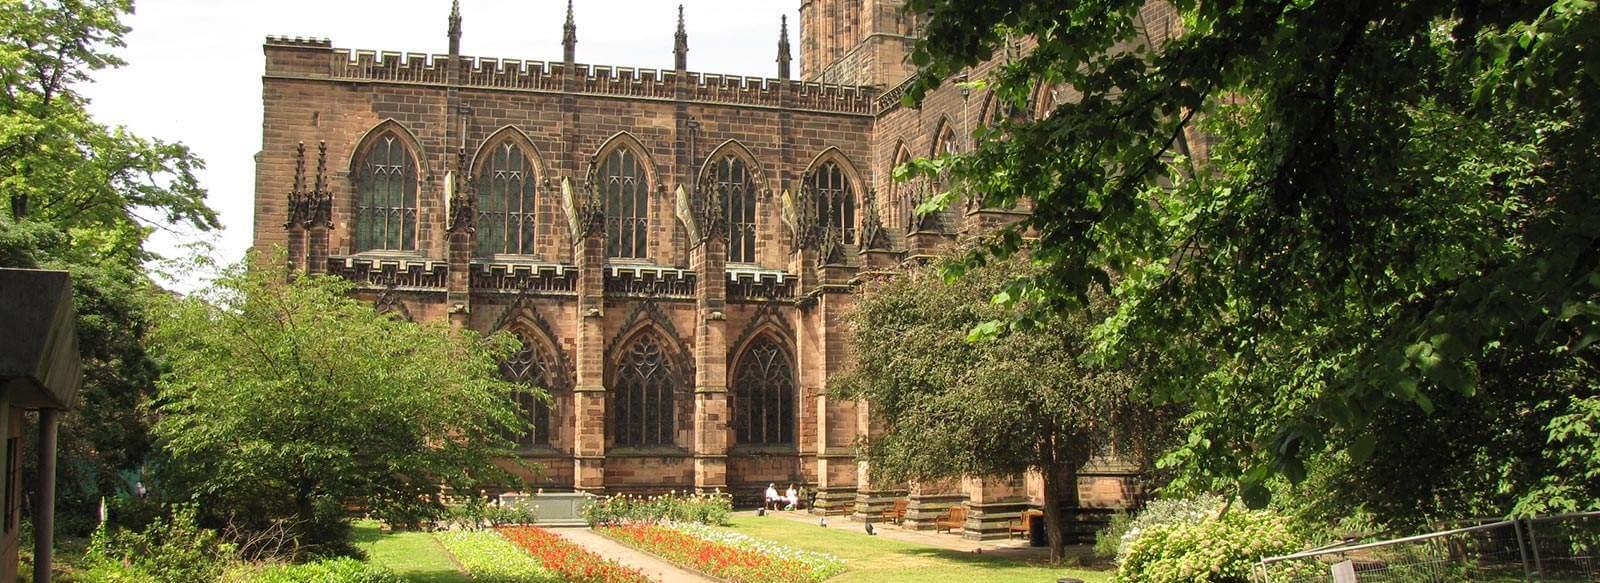 Chester tourist information